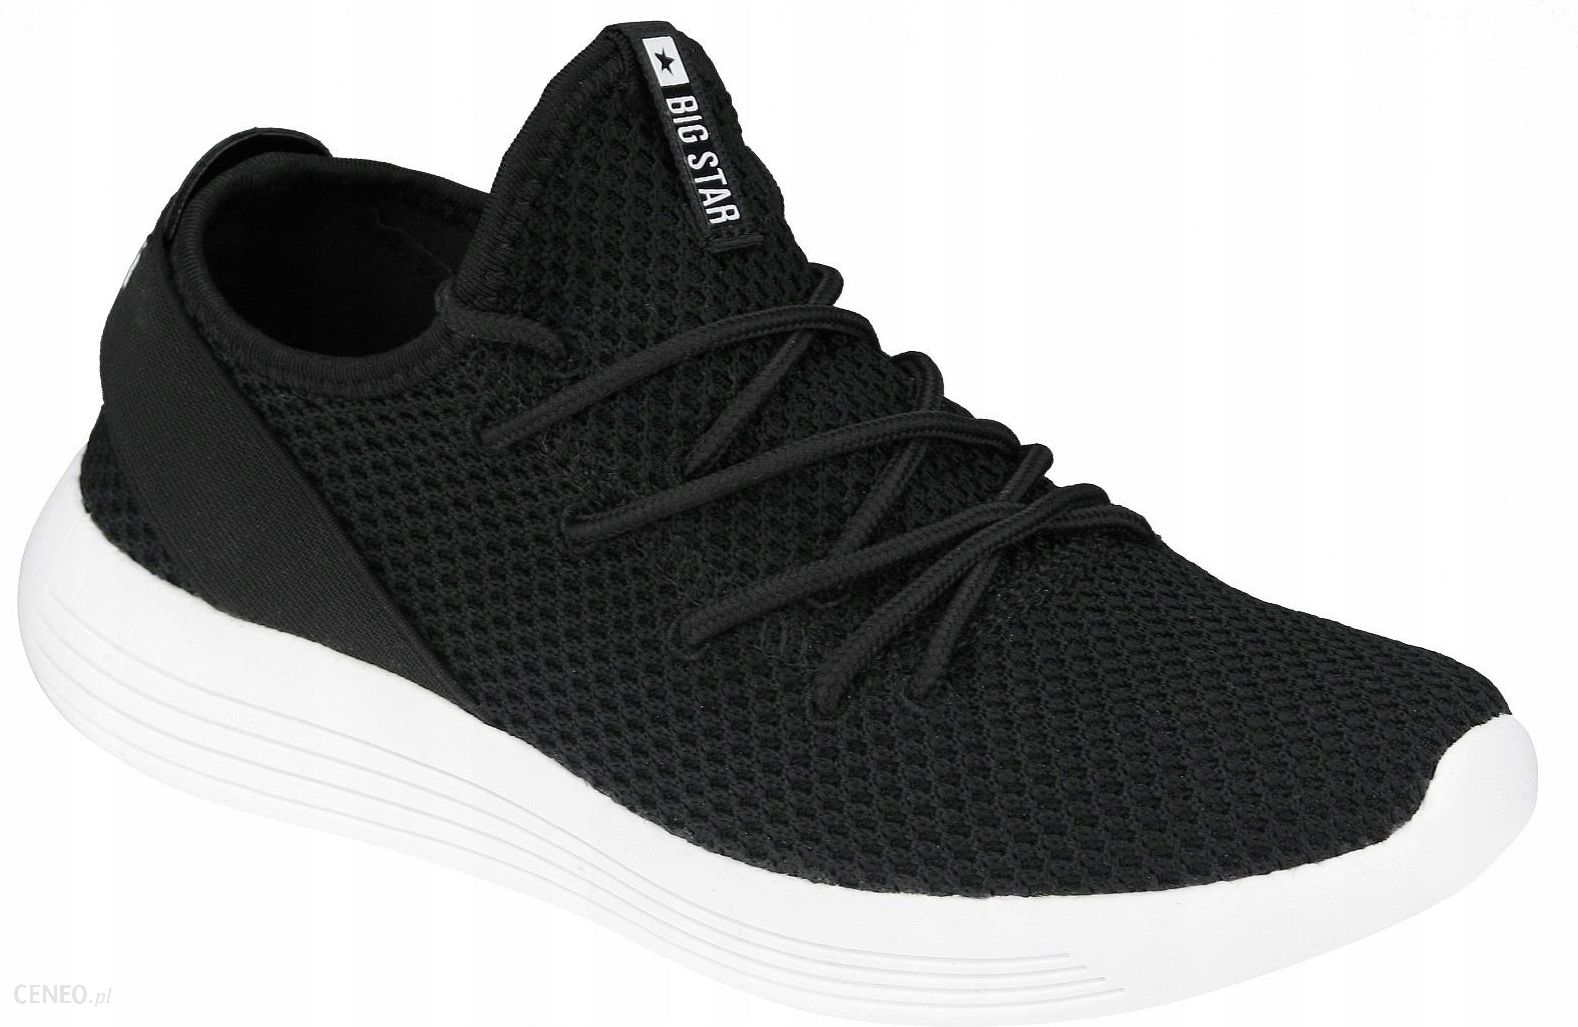 Sportowe czarne buty sneakersy Big Star DD274454